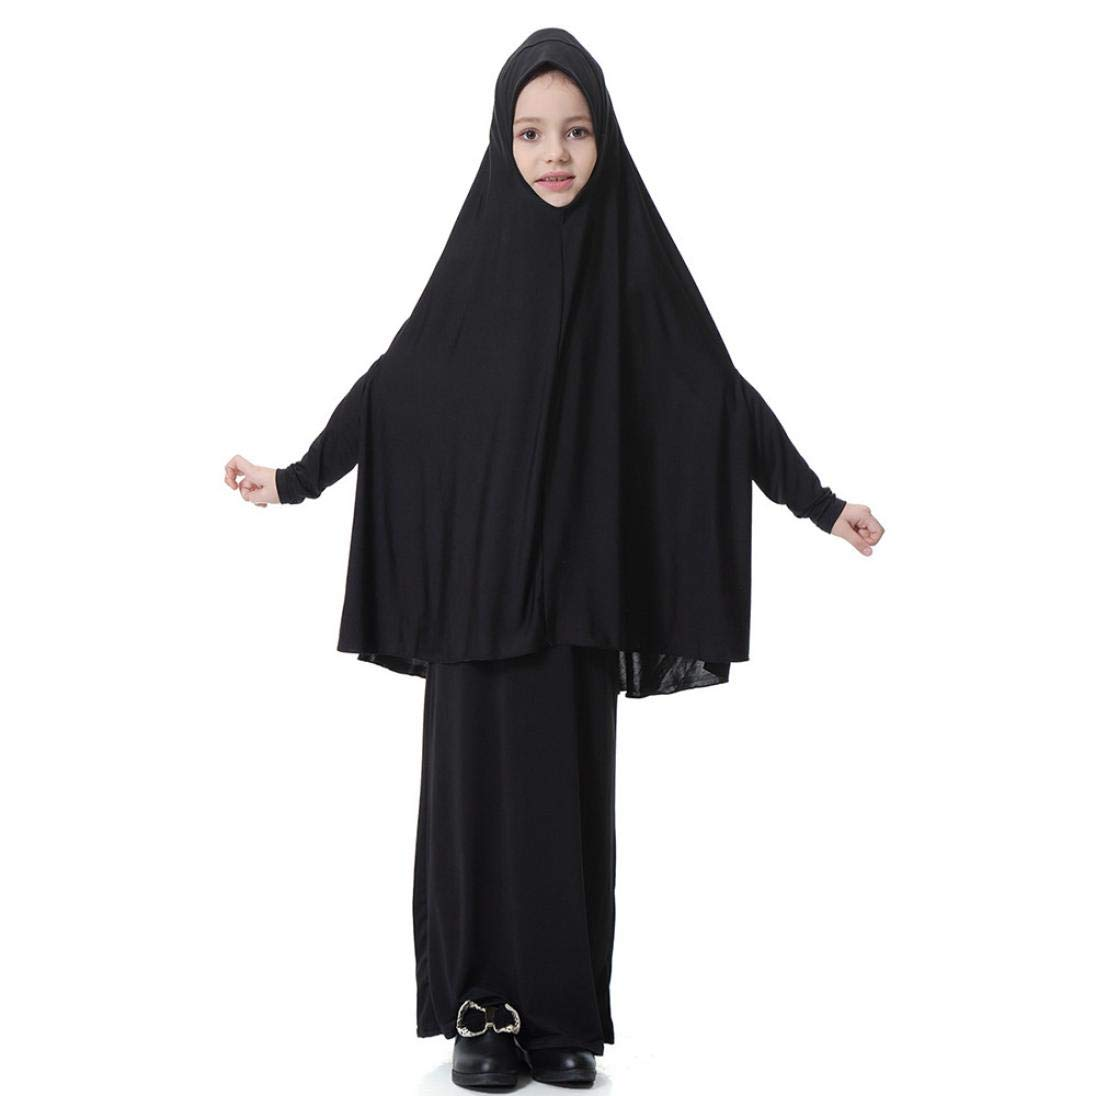 Sunma-ma 2Pcs Kid Child Fashion and Casual Dress Set -Muslim Batwing Sleeve Blouse O-neck Top Long Skirt Outfits Set by Suma-ma